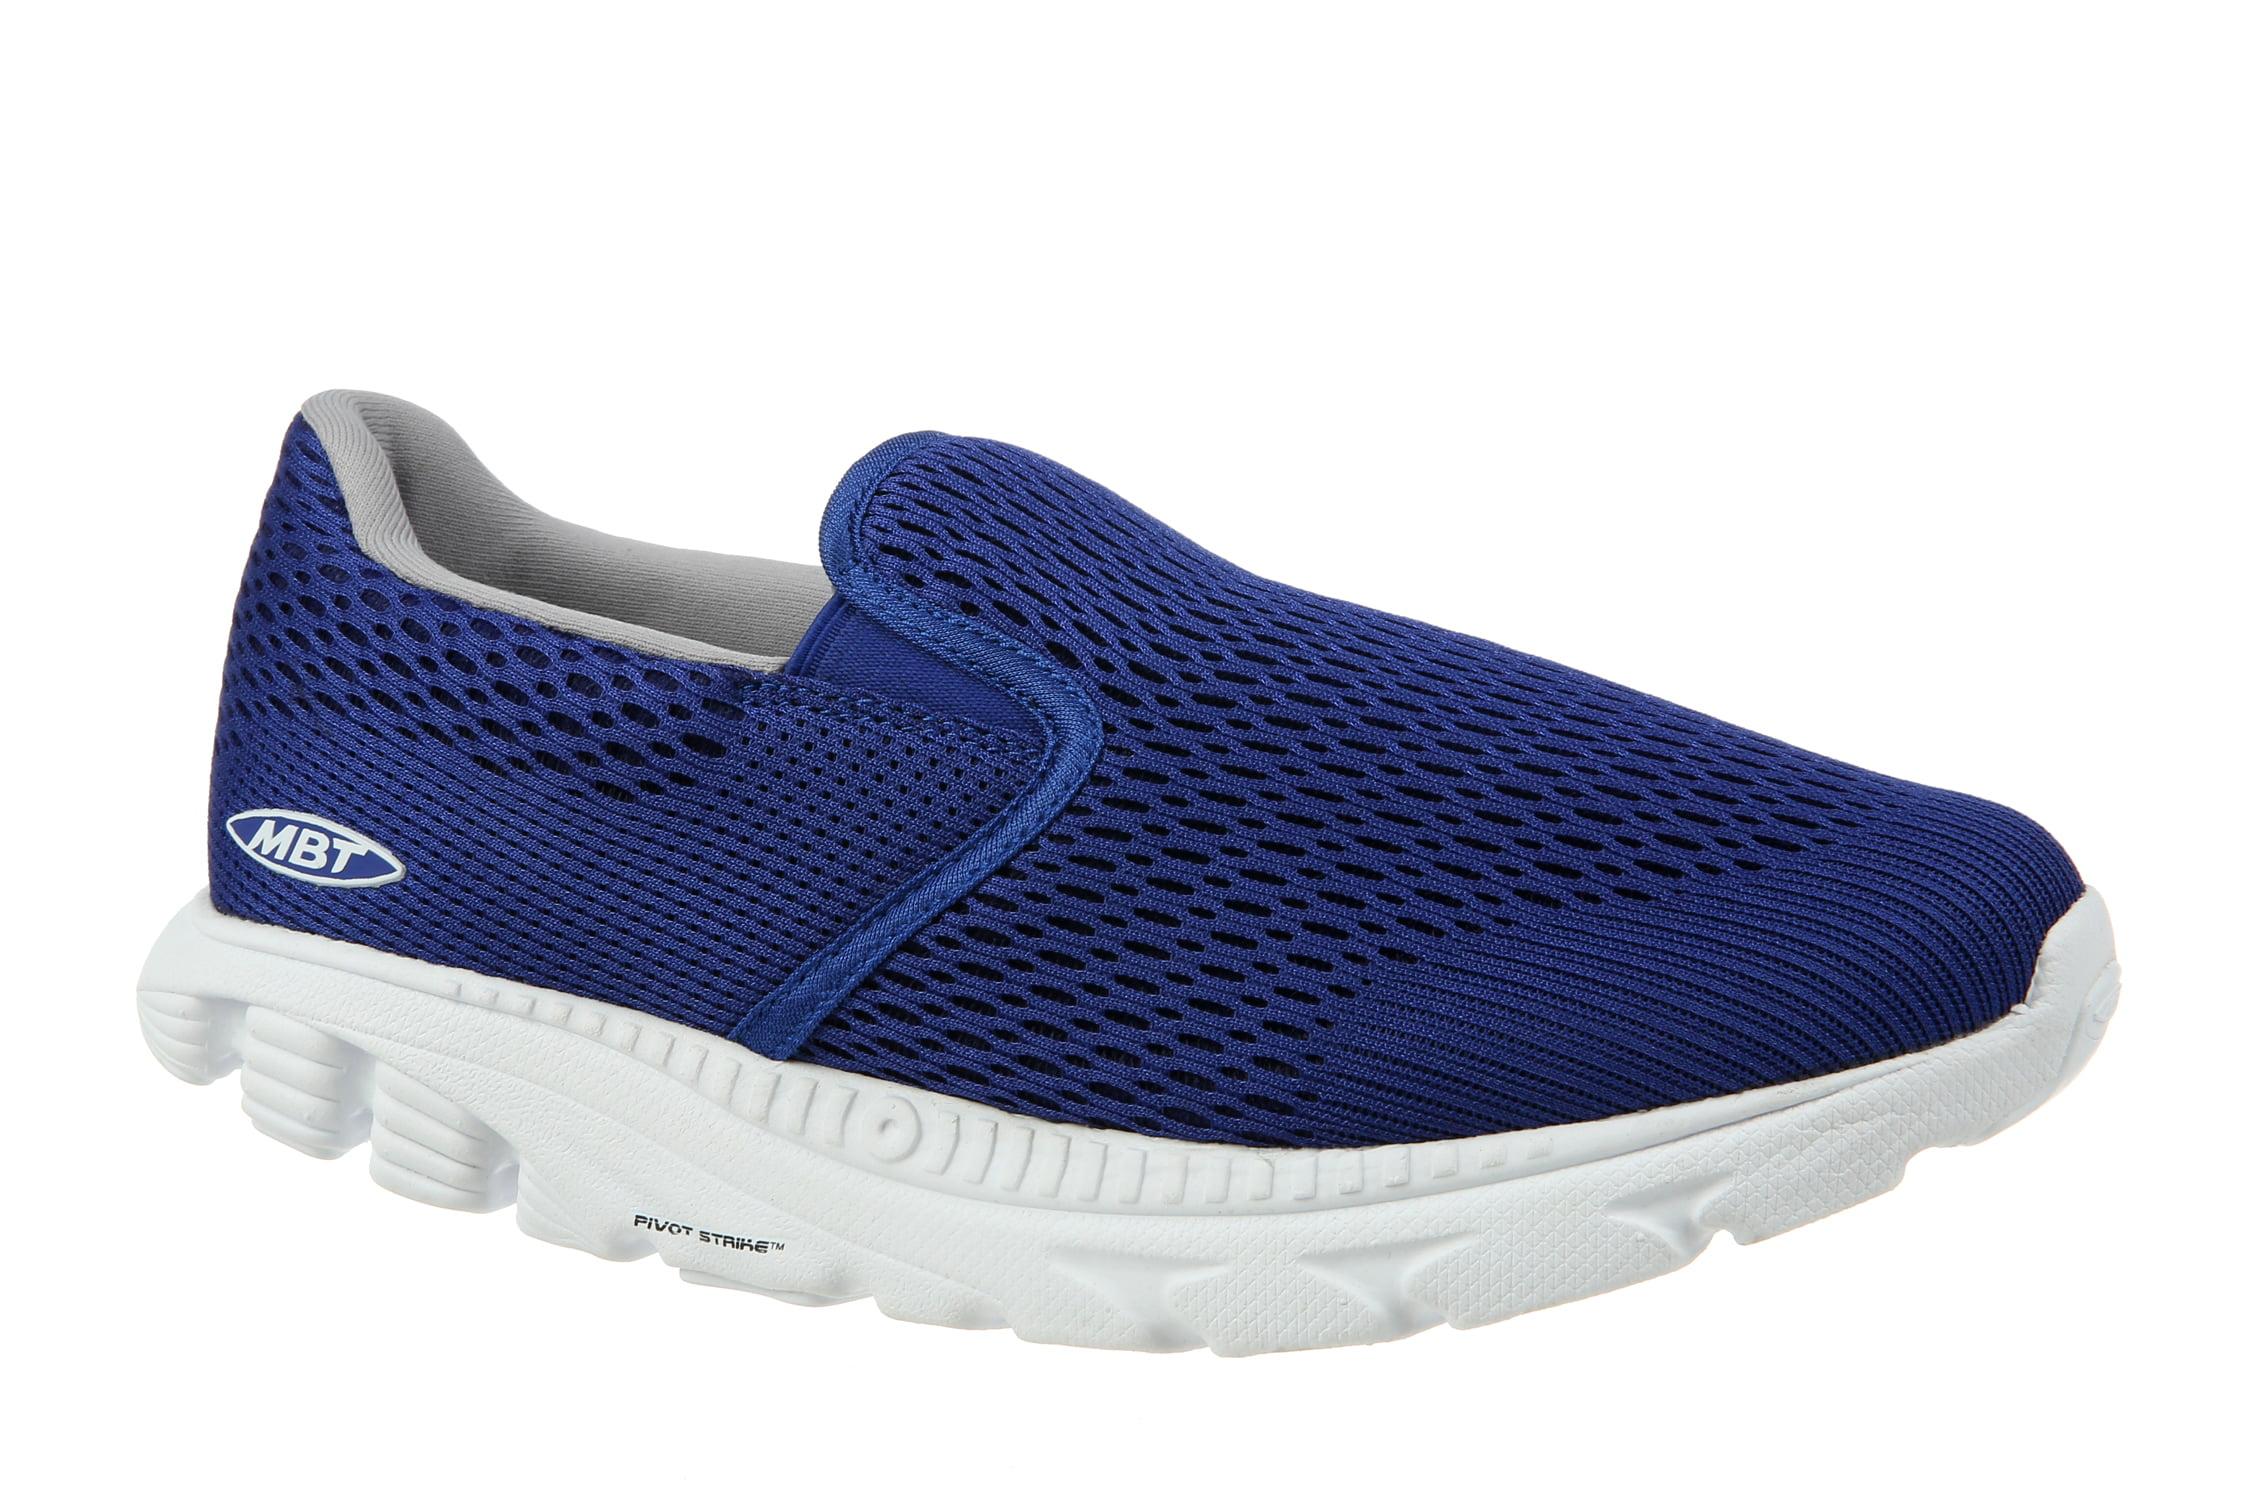 dce730ddc07a MBT Shoes Women s Speed 17 Slip-on Athletic Shoe  6.5 Medium (B) Red Slip-on  Slip On - Walmart.com